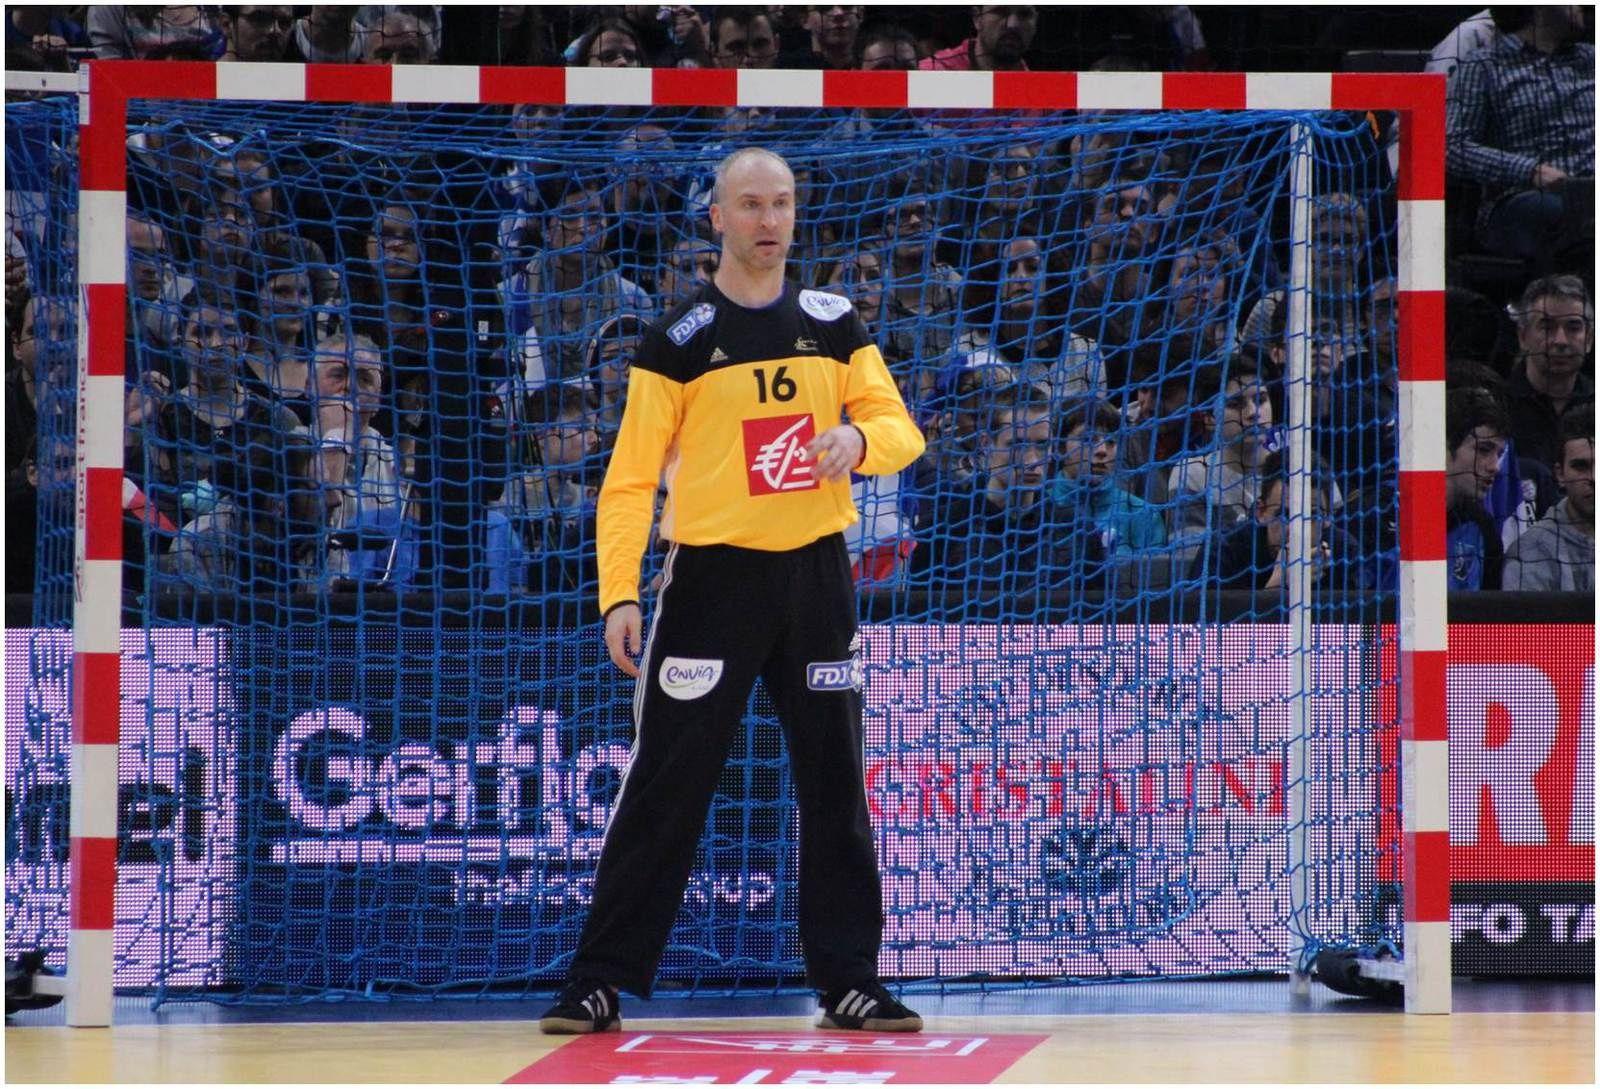 Golden League 2016 (AccorHôtelsArena - 10.01.2016) 2/2